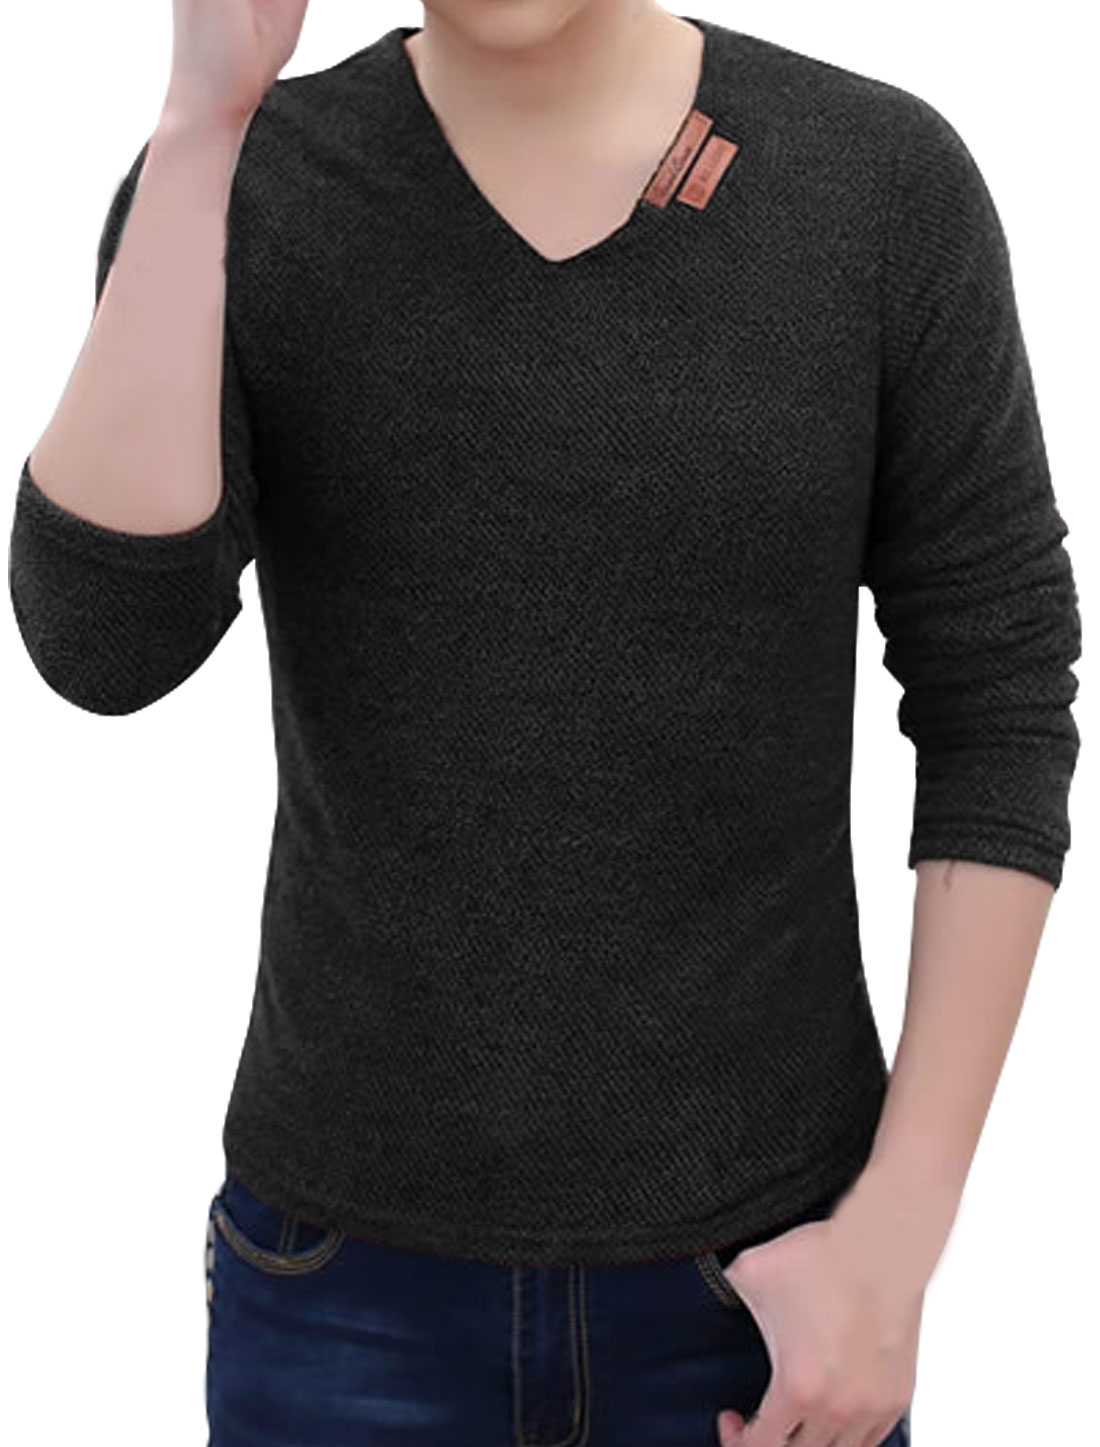 Men V Neck Long Sleeves Semi Sheer Slim Fit Mesh Tee Shirt Black M